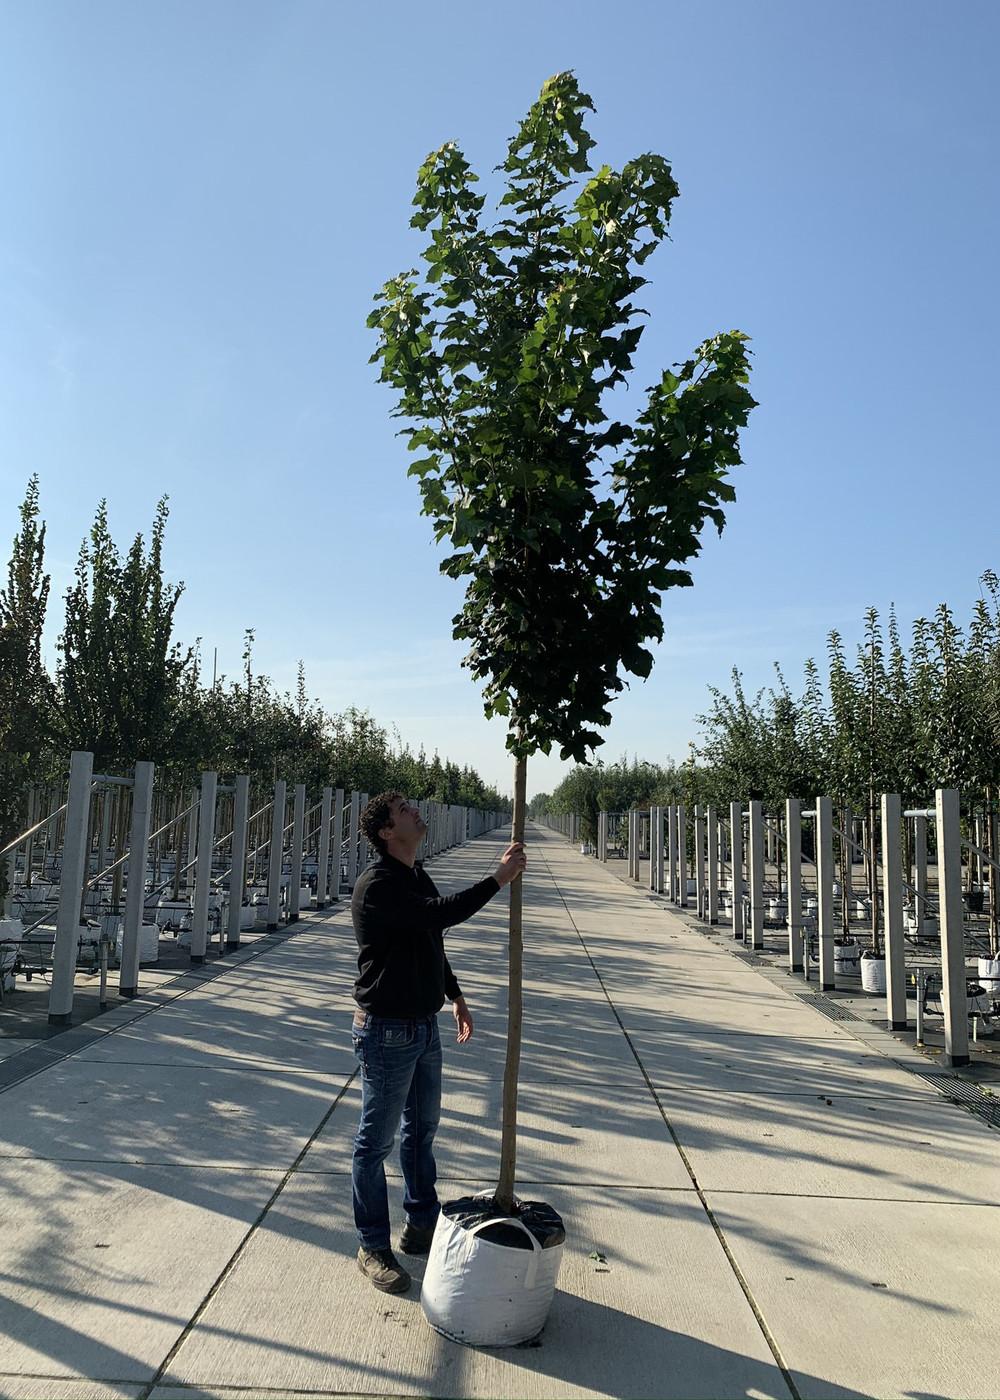 Spitz-Ahorn 'Columnare' | Acer platanoids 'Columnare'